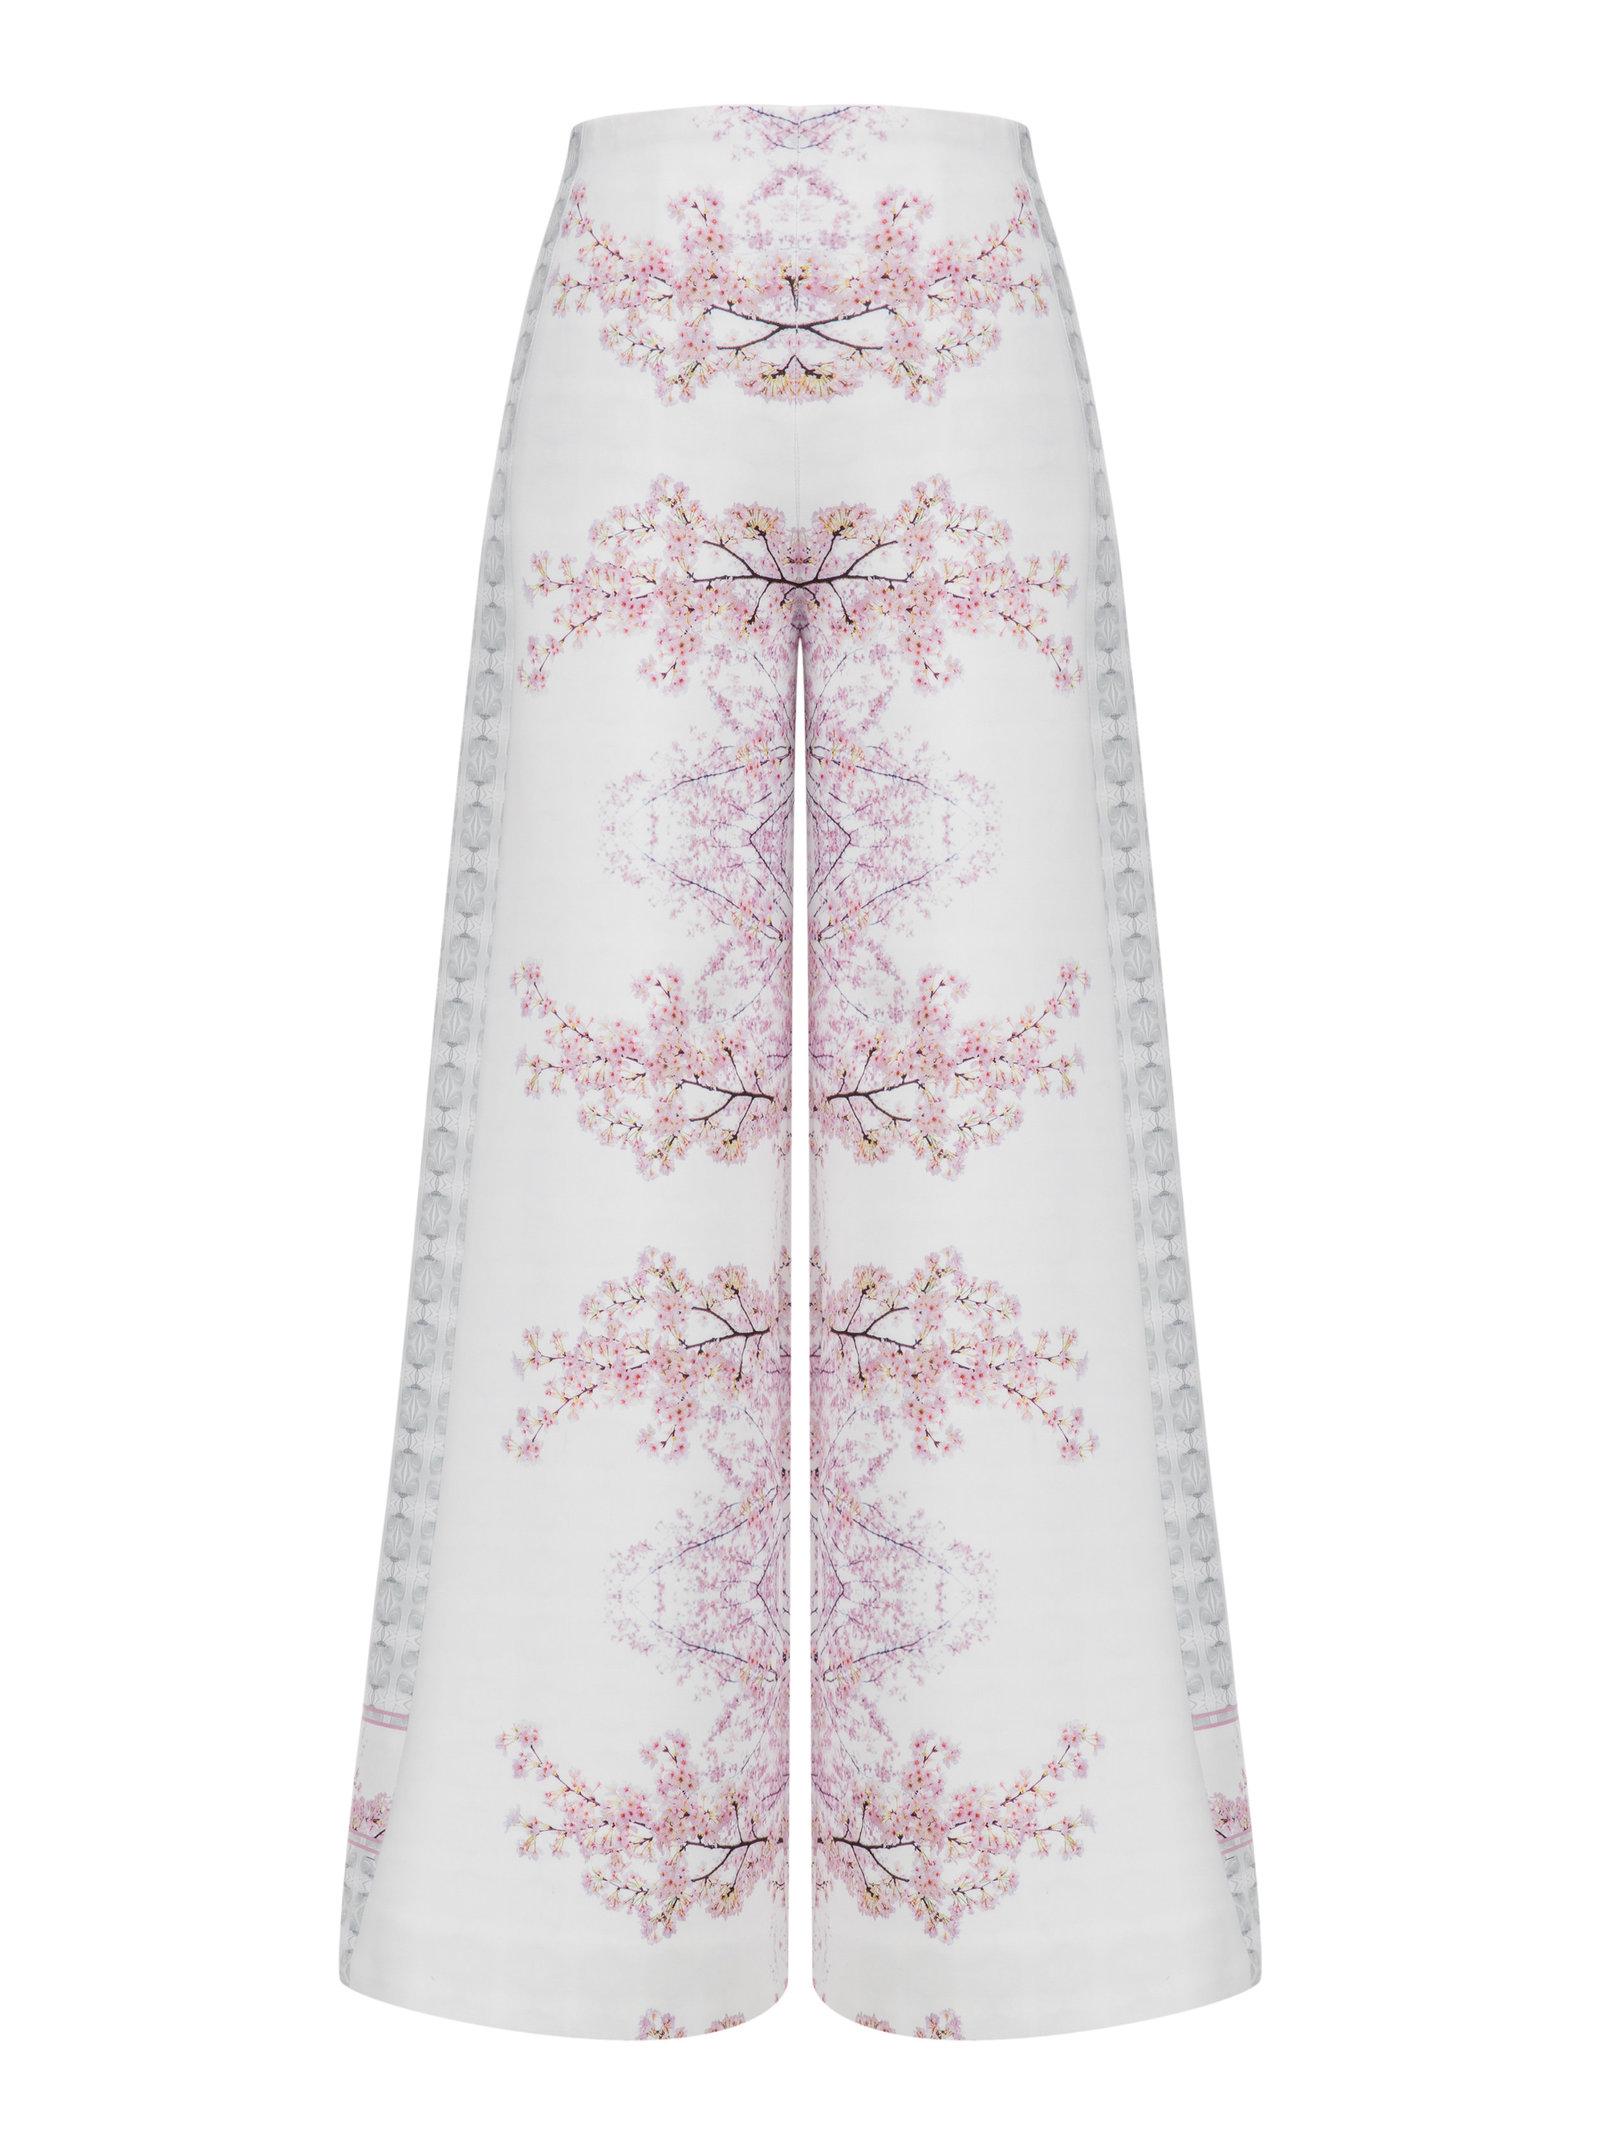 Ece Ozalp Cherry Blossom Pants